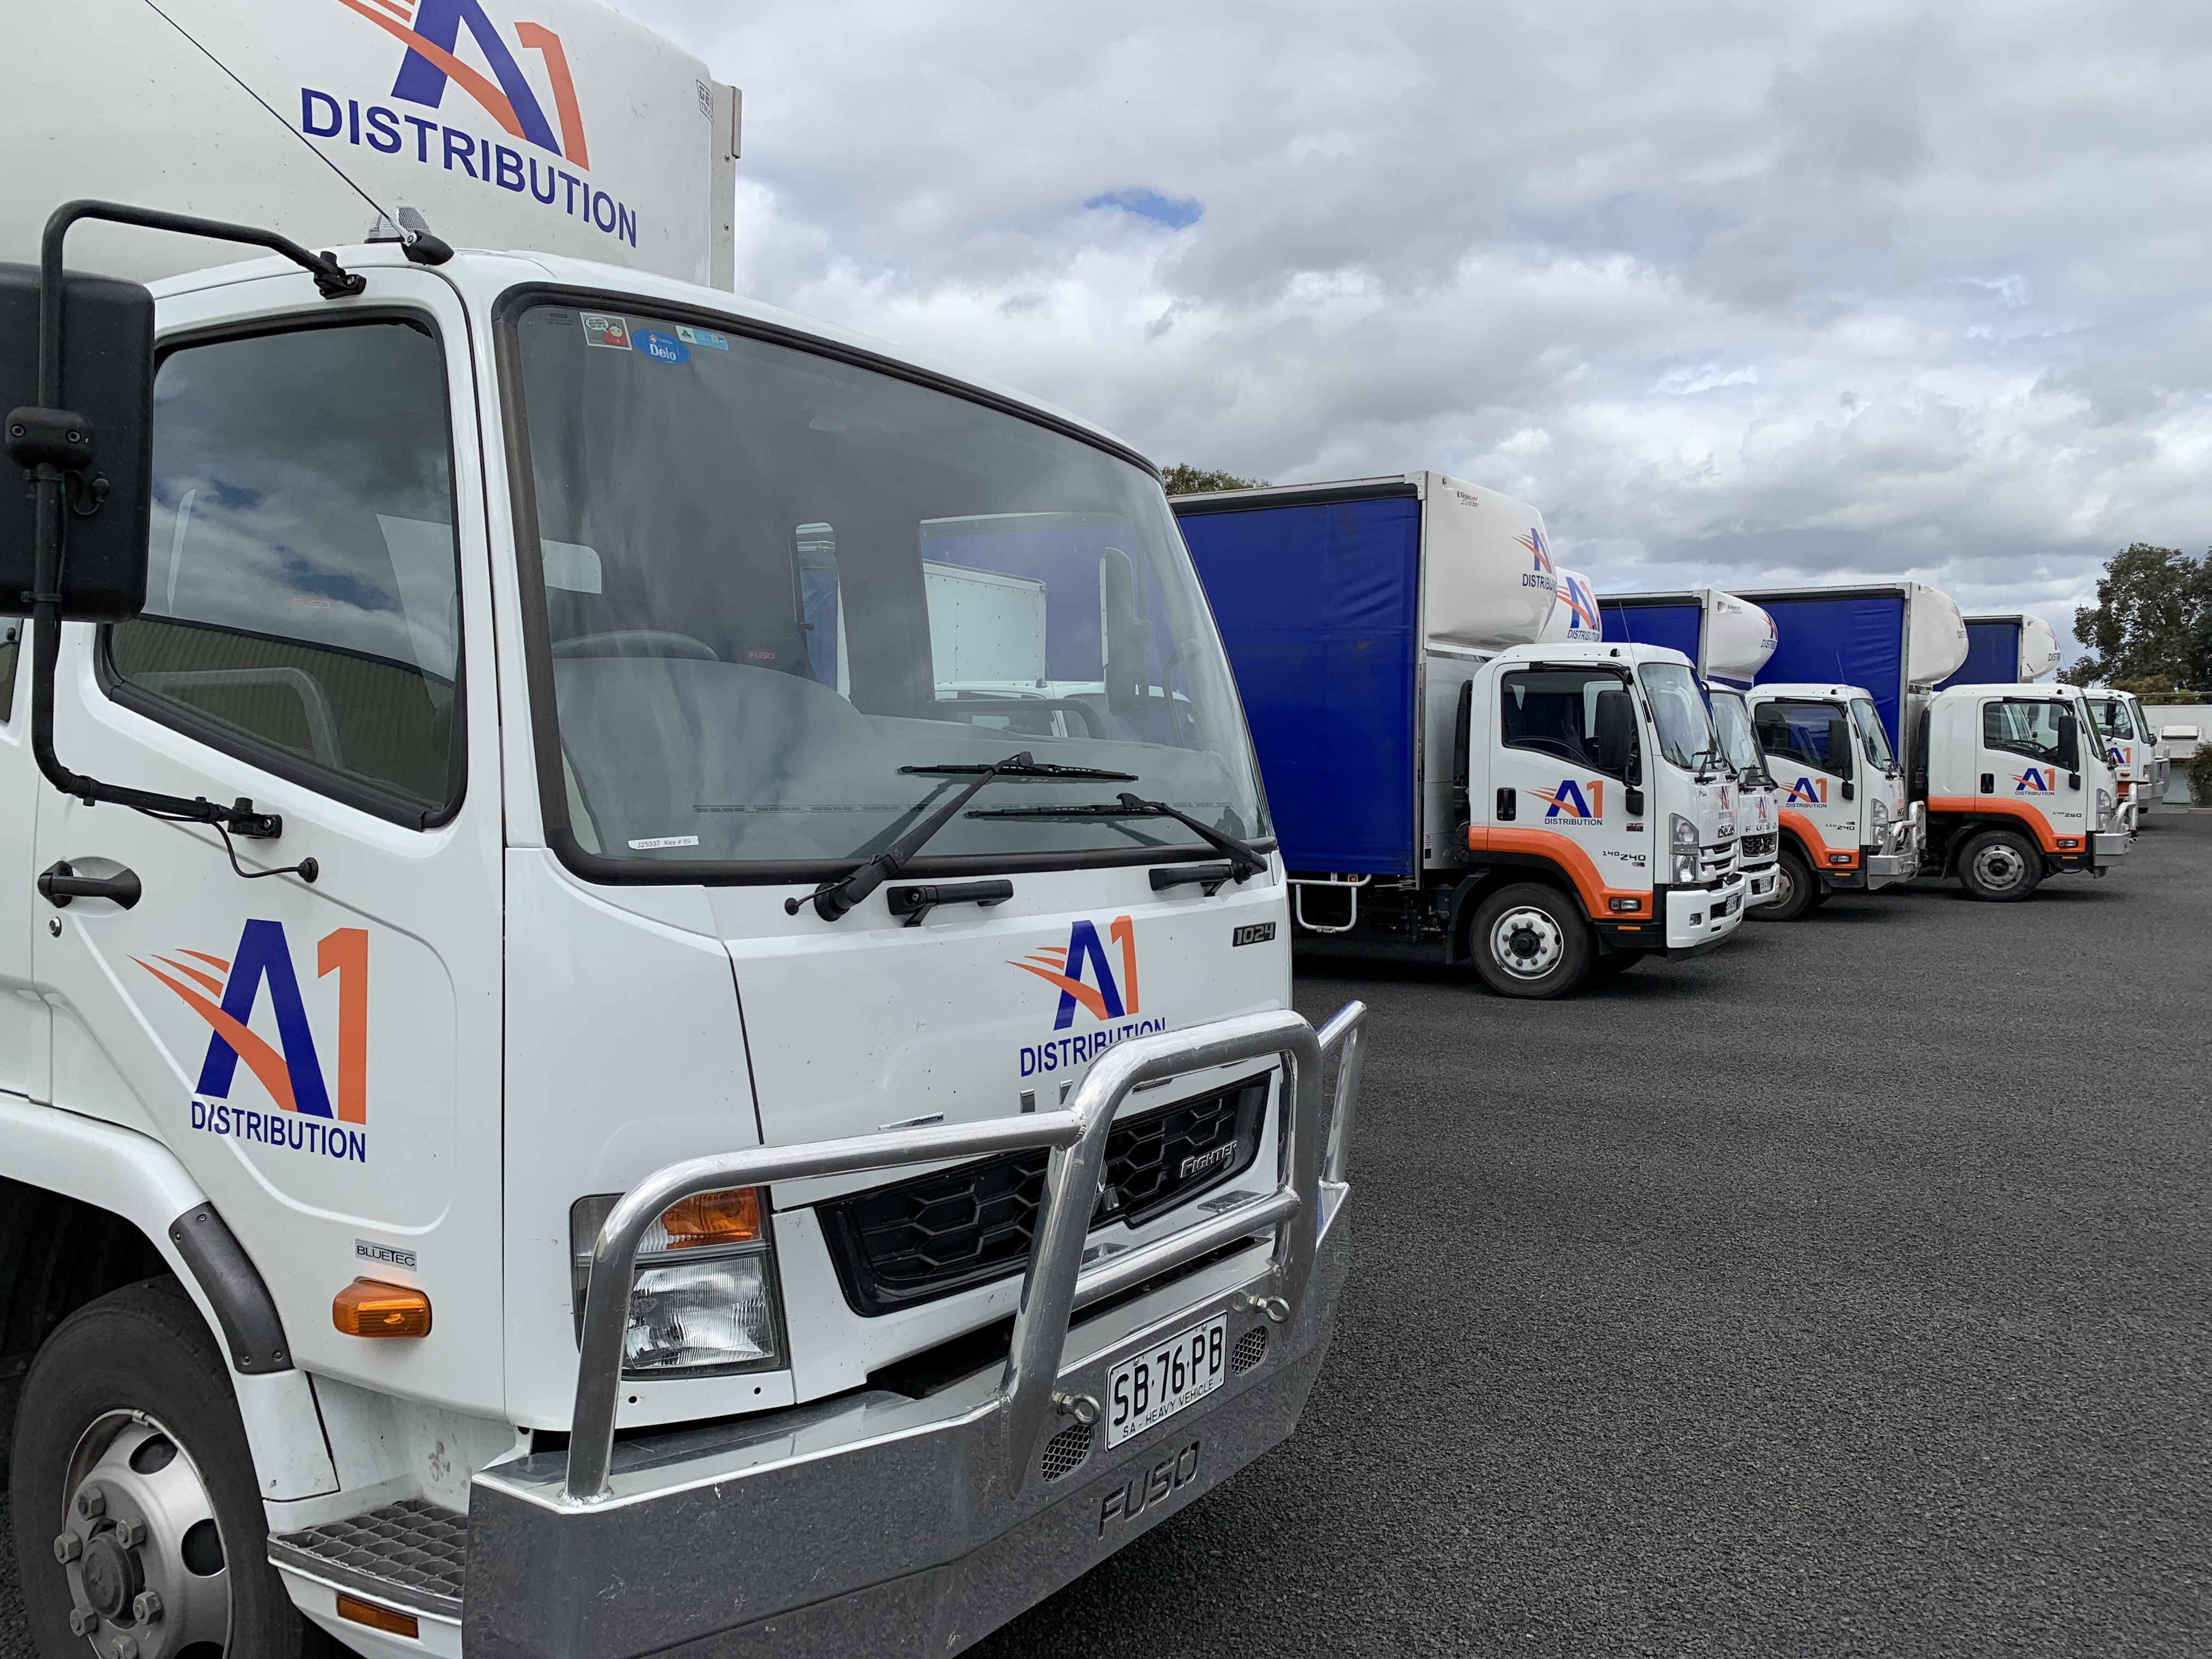 Fleet Signage A1 Distribution